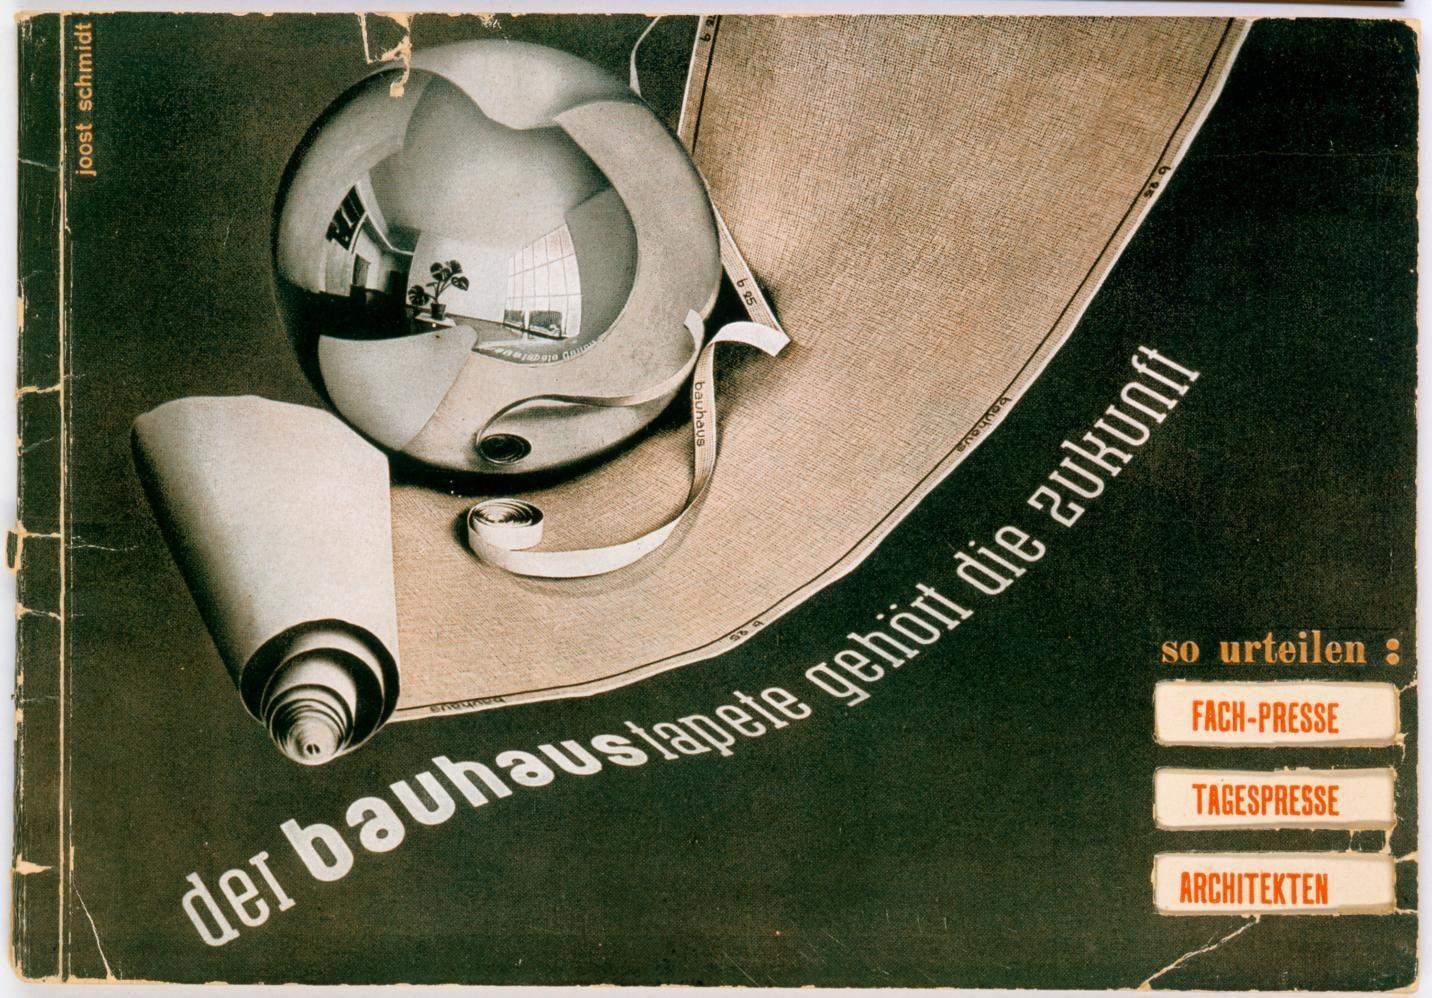 titelblatt des bauhaus tapeten katalogs der bauhaustapete geh rt die zukunft gestaltung. Black Bedroom Furniture Sets. Home Design Ideas